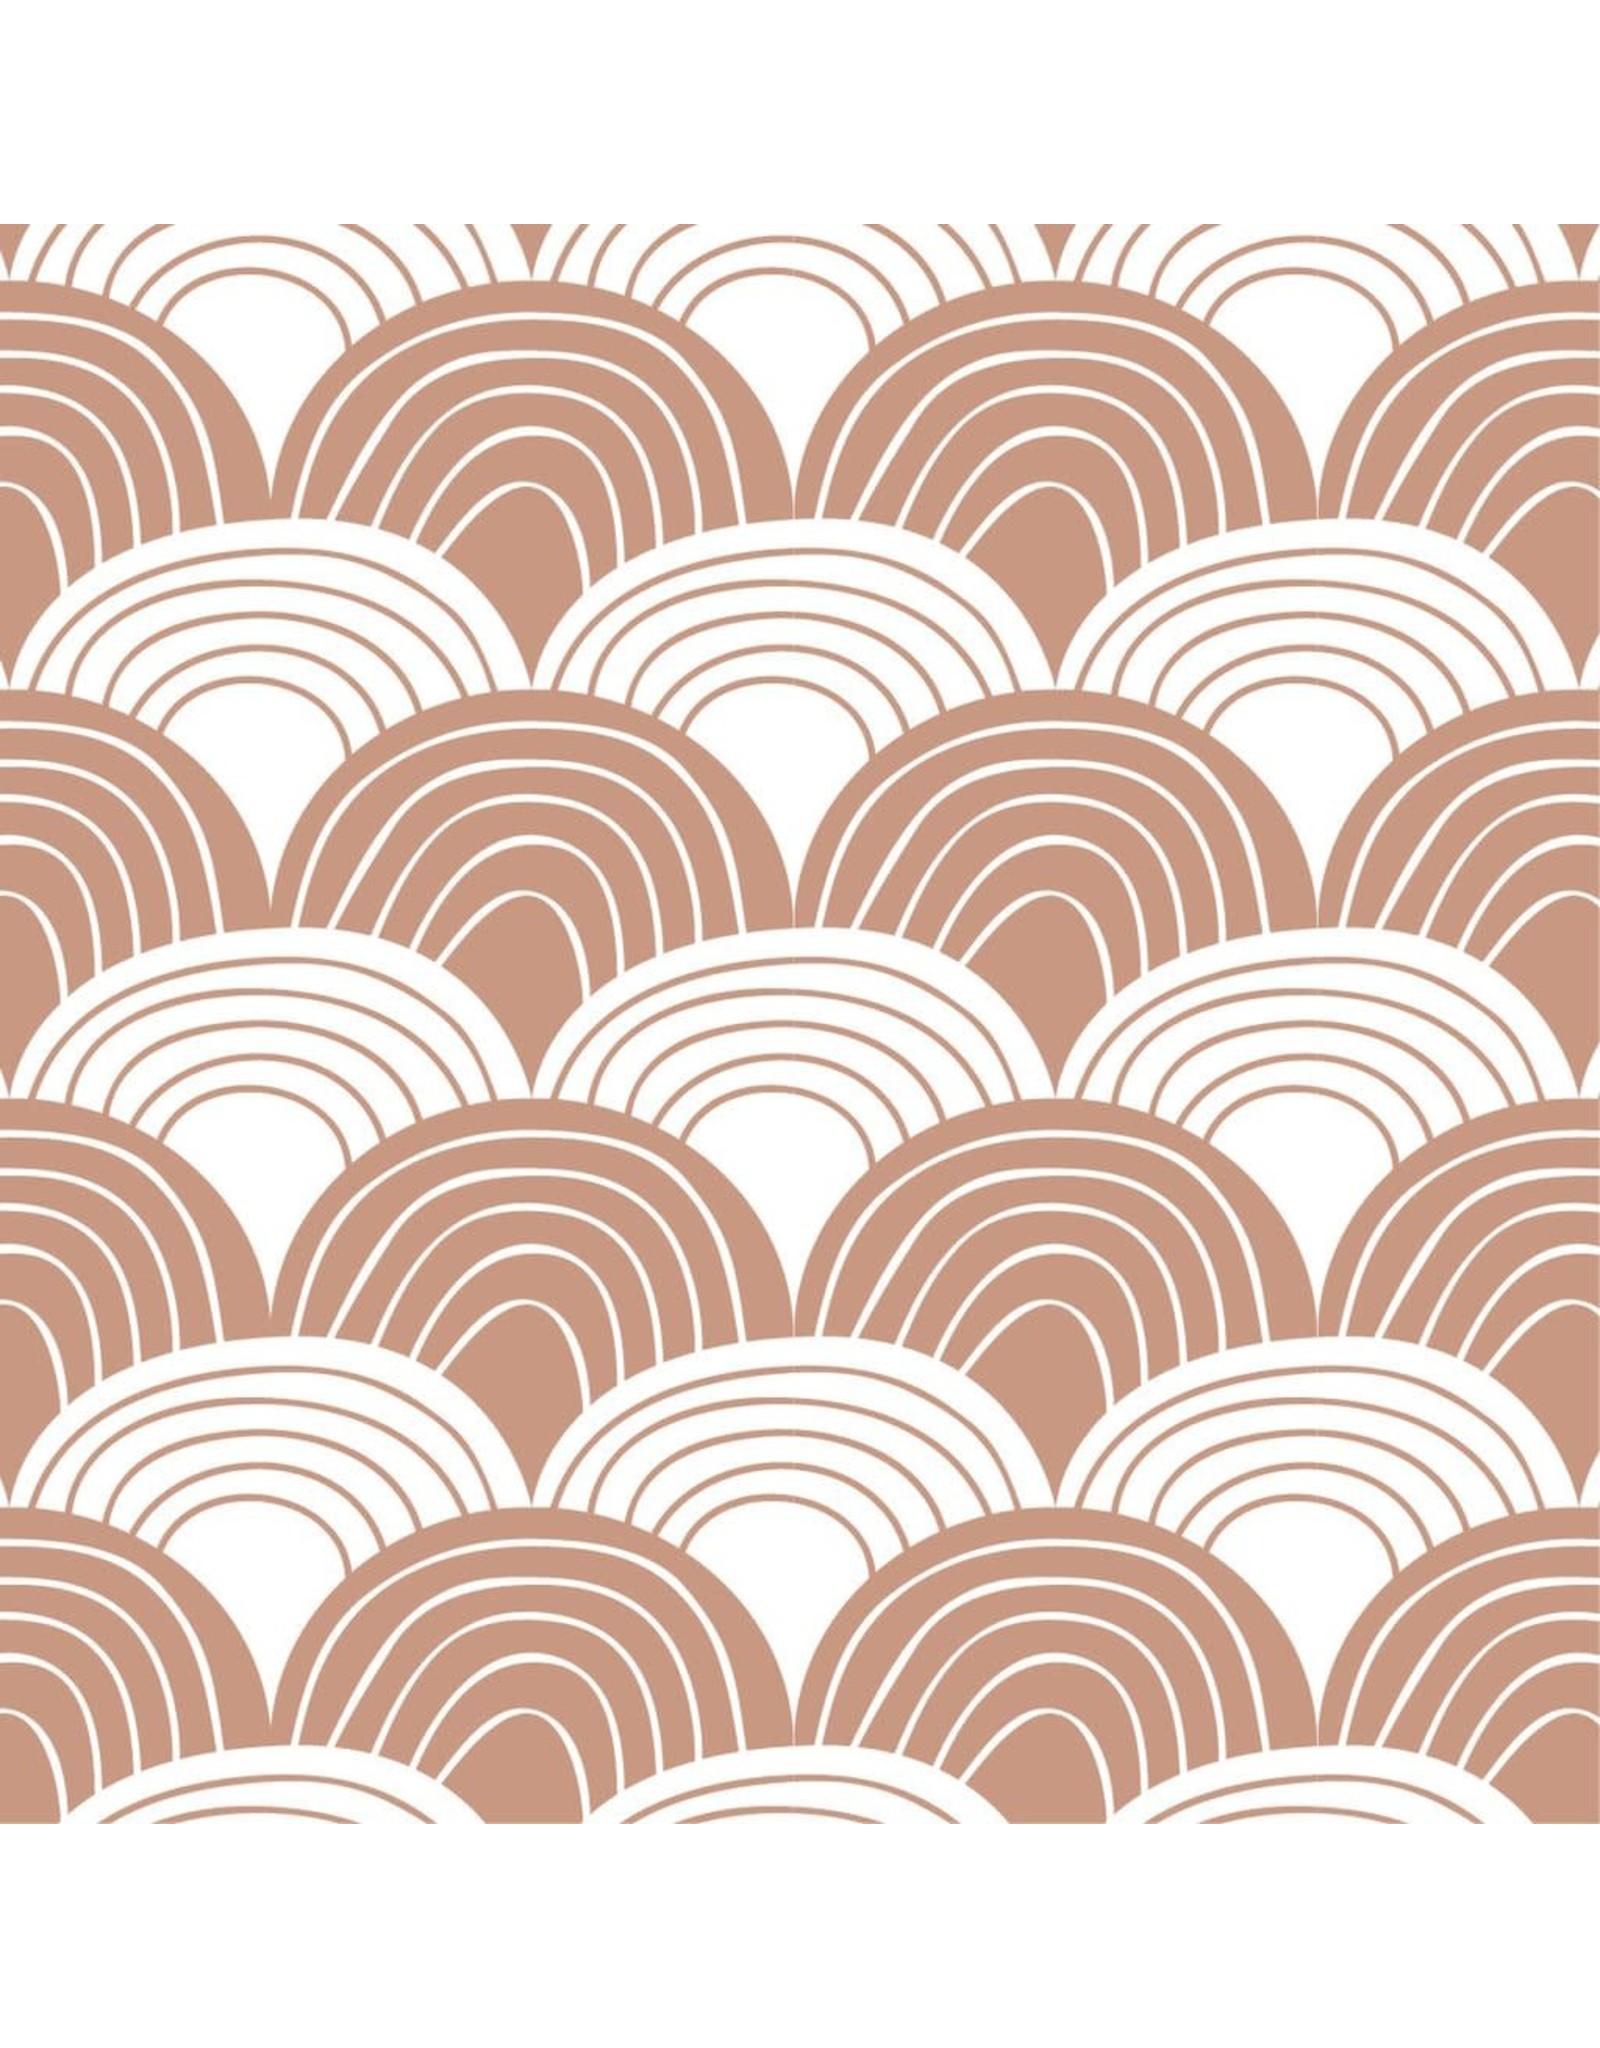 Swedish Linens Swedish Linens hoeslaken Rainbows terracotta pink, 70 x 140 cm